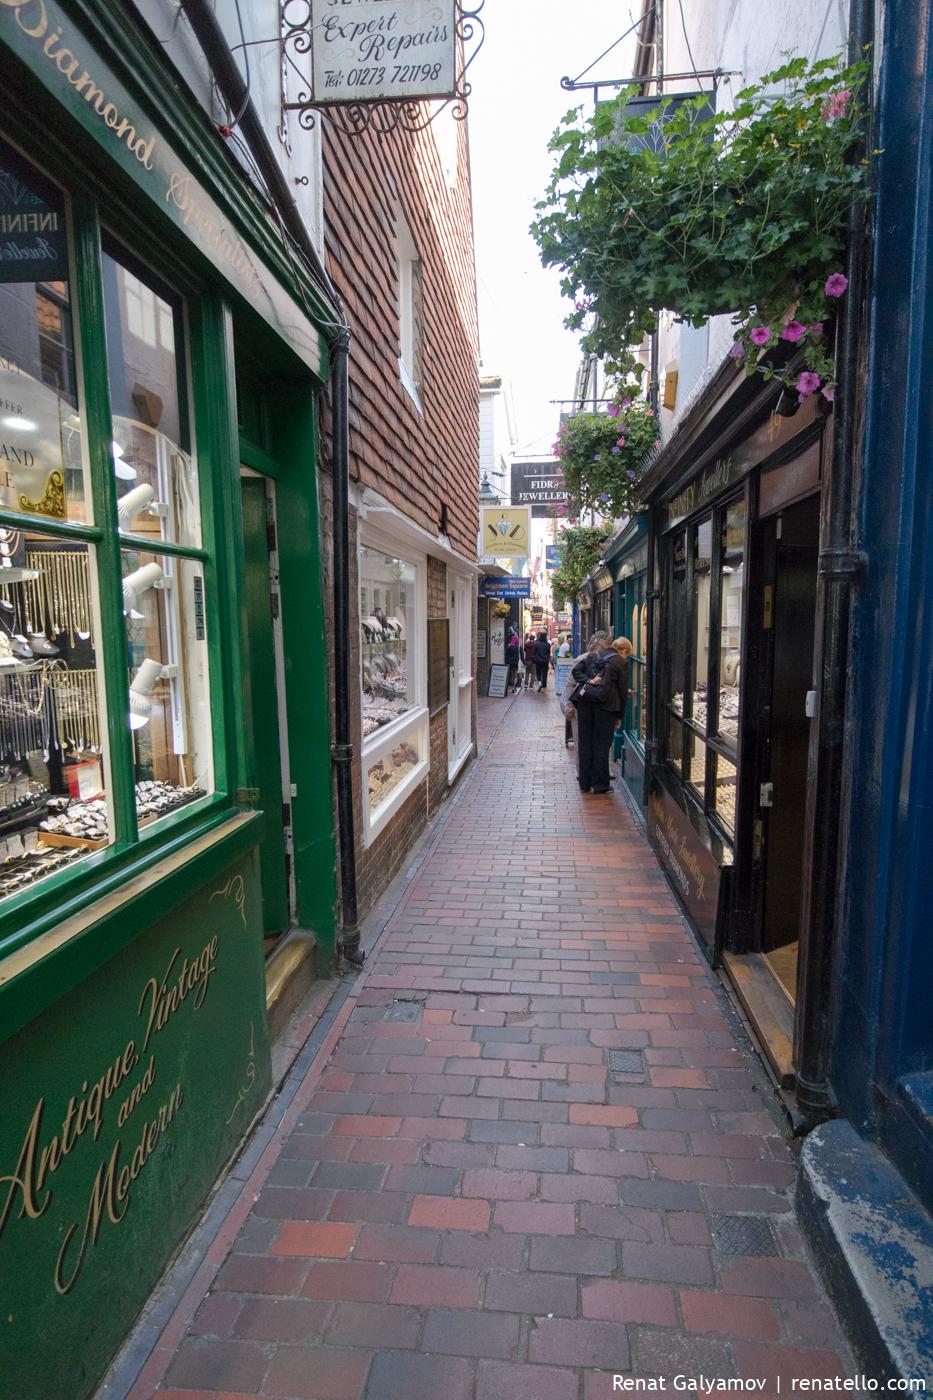 Narrow street in The Lanes, Brighton